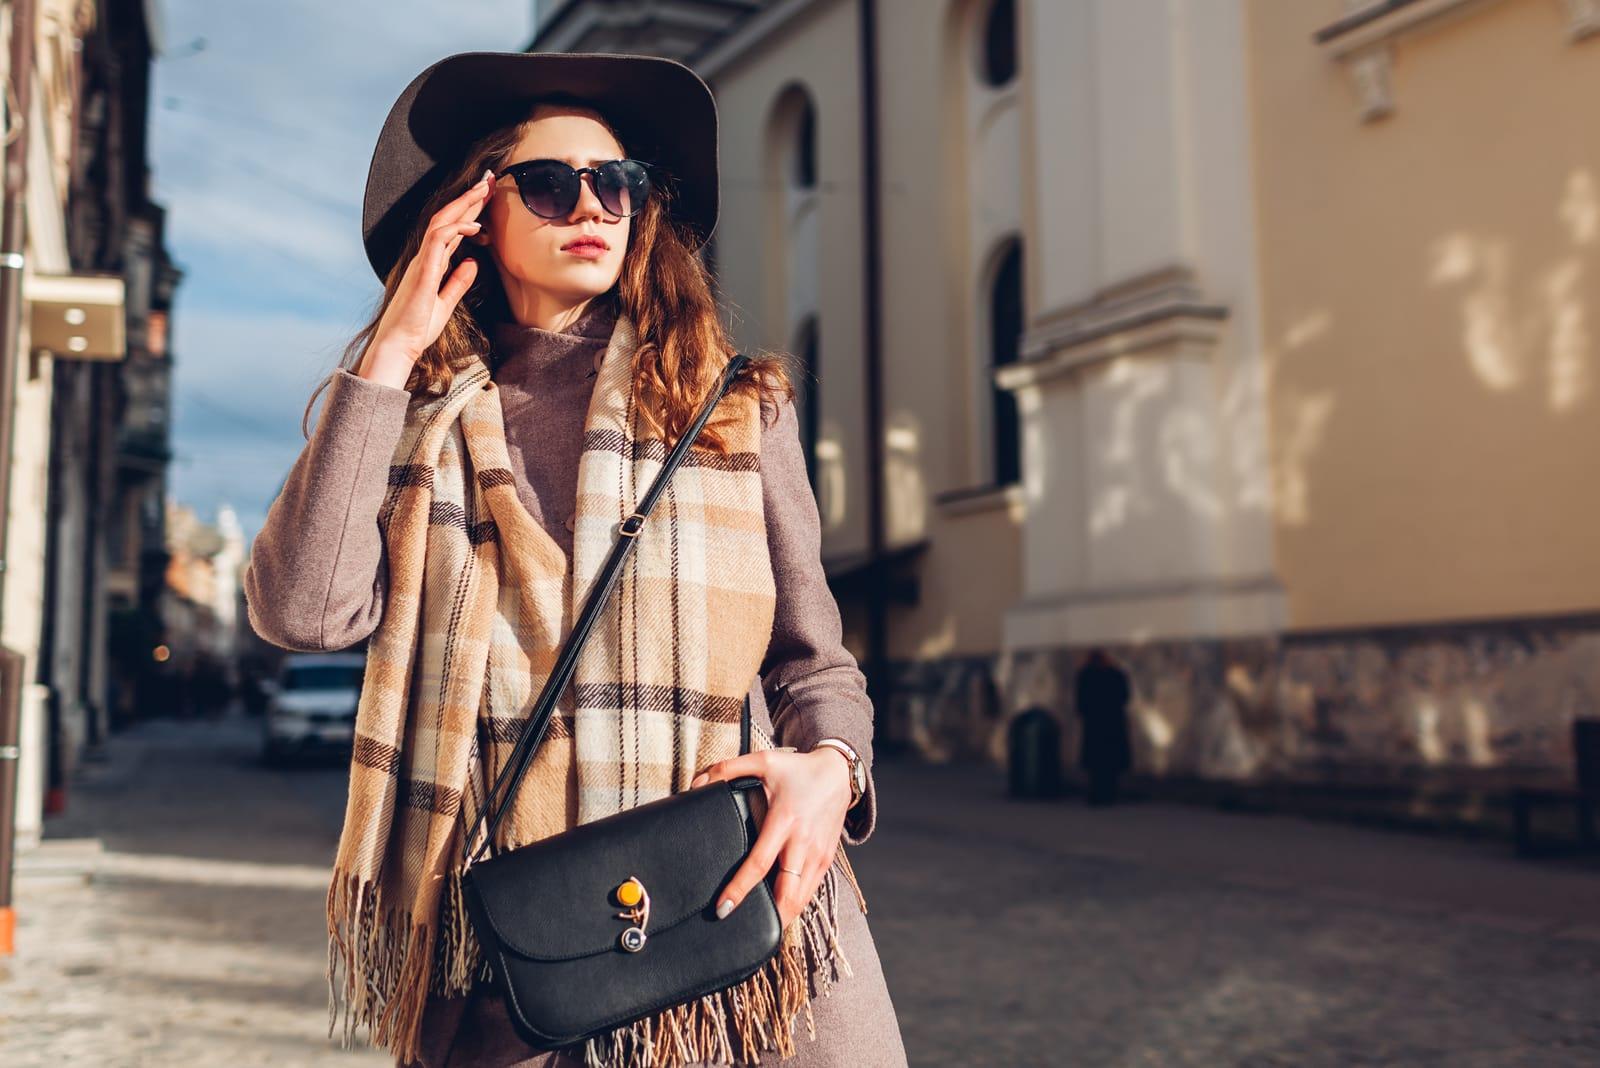 stylish young woman wearing hat